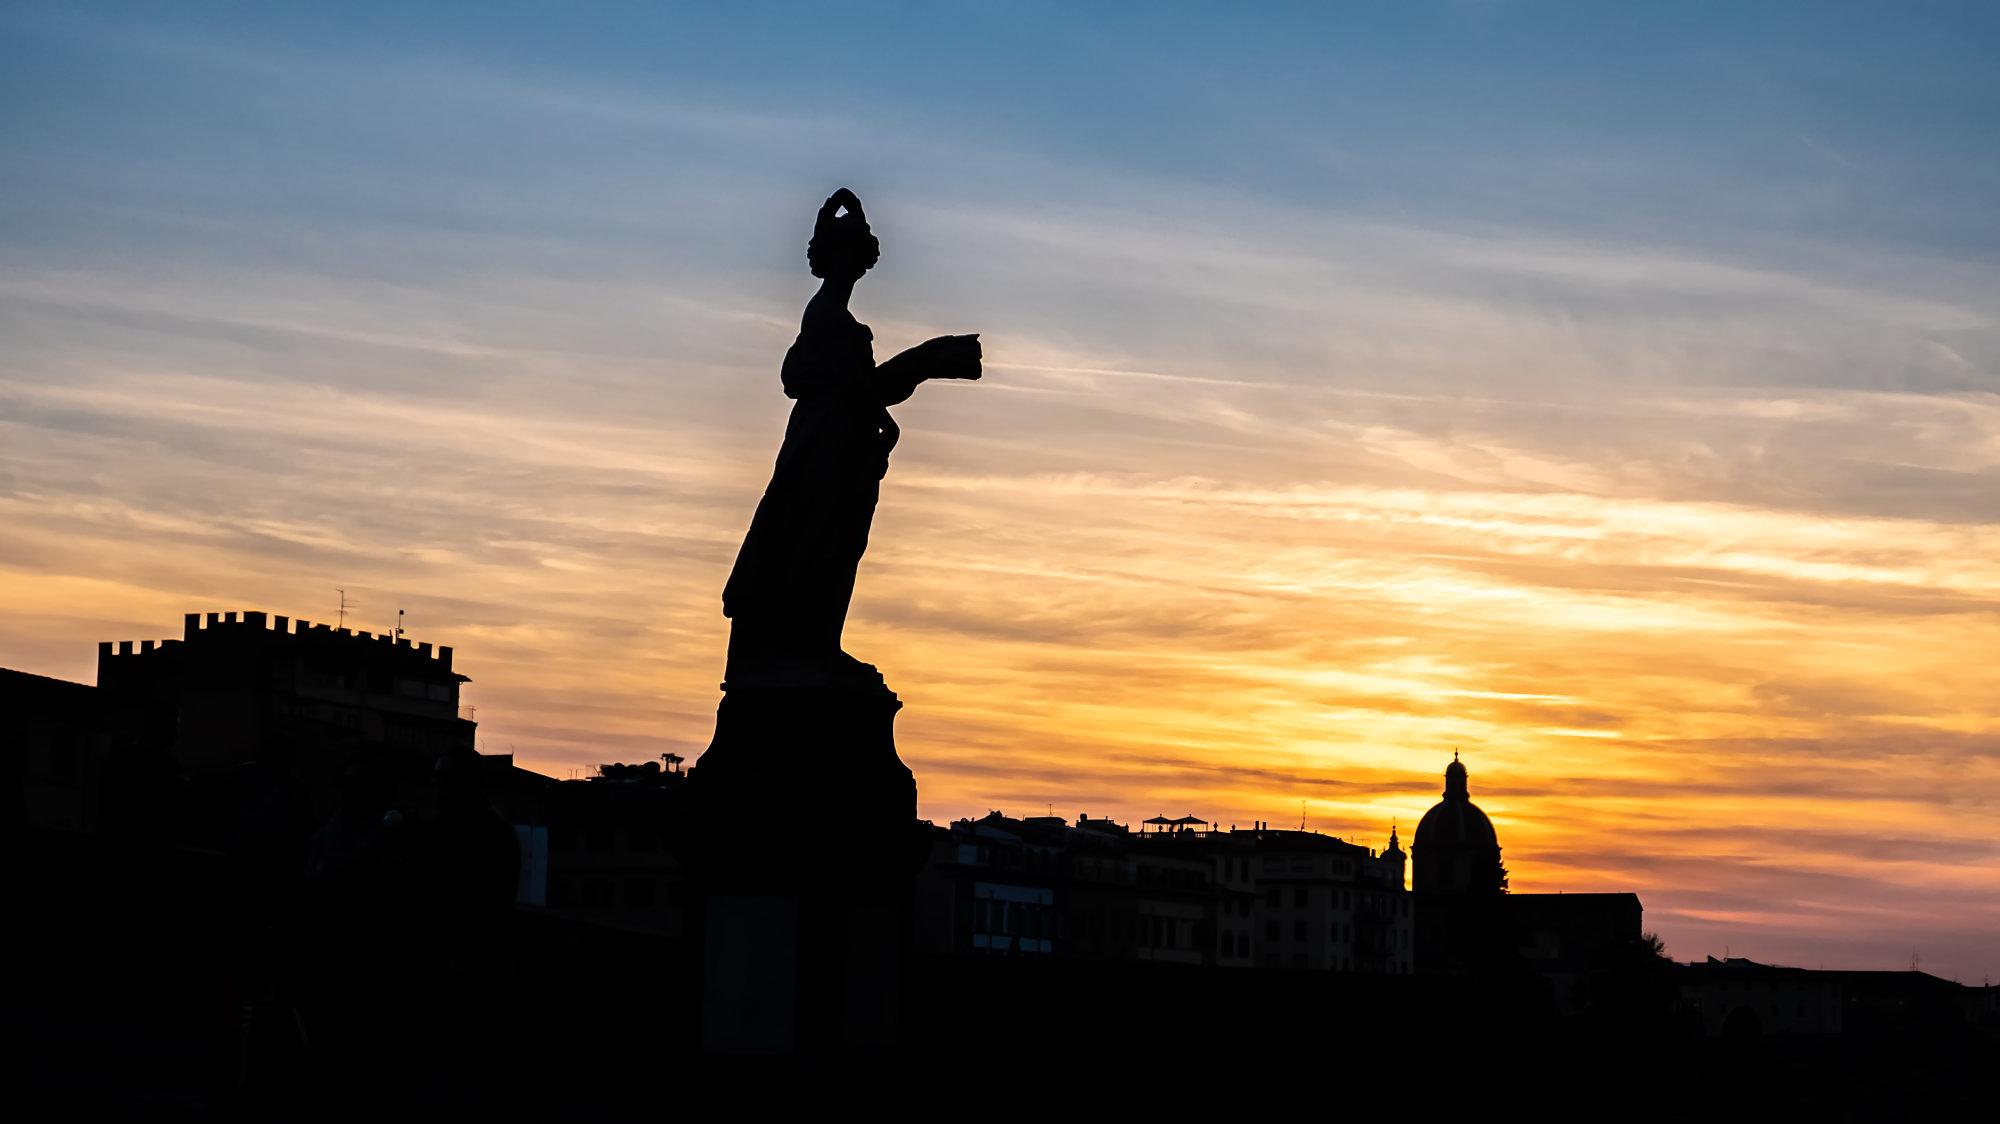 Sunset on Florence #2